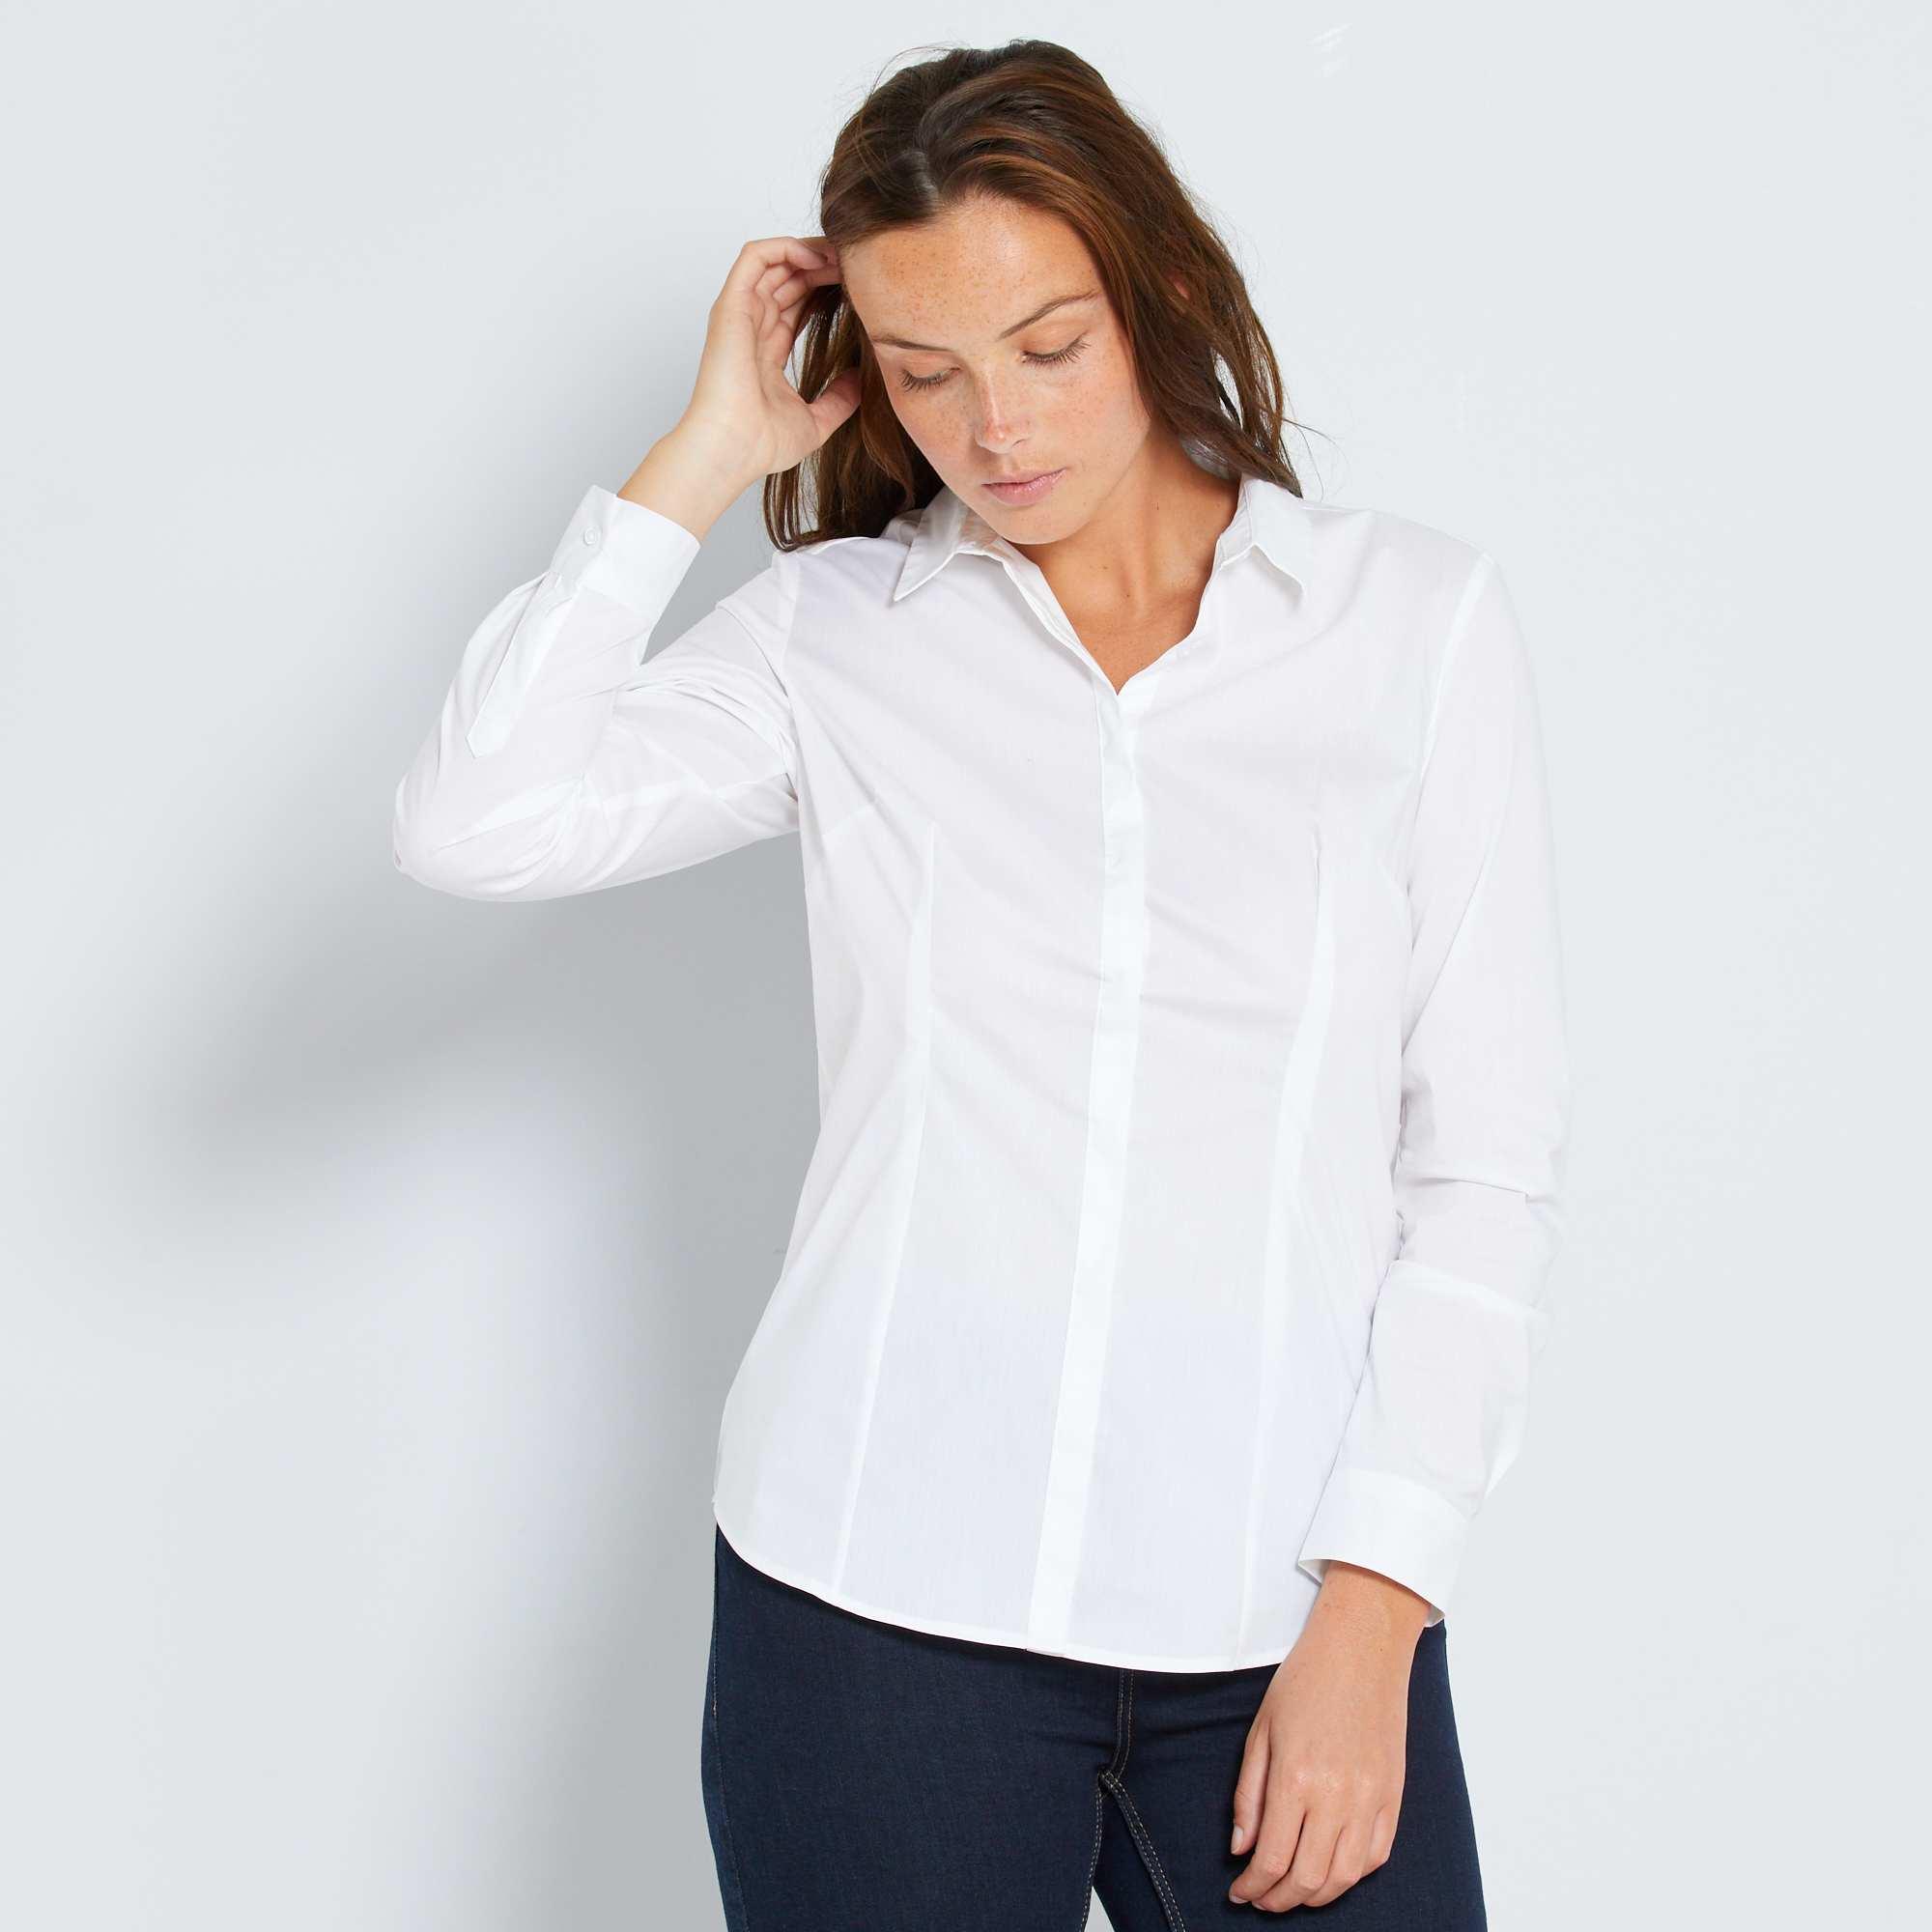 chemise cintr e en popeline stretch femme blanc kiabi. Black Bedroom Furniture Sets. Home Design Ideas